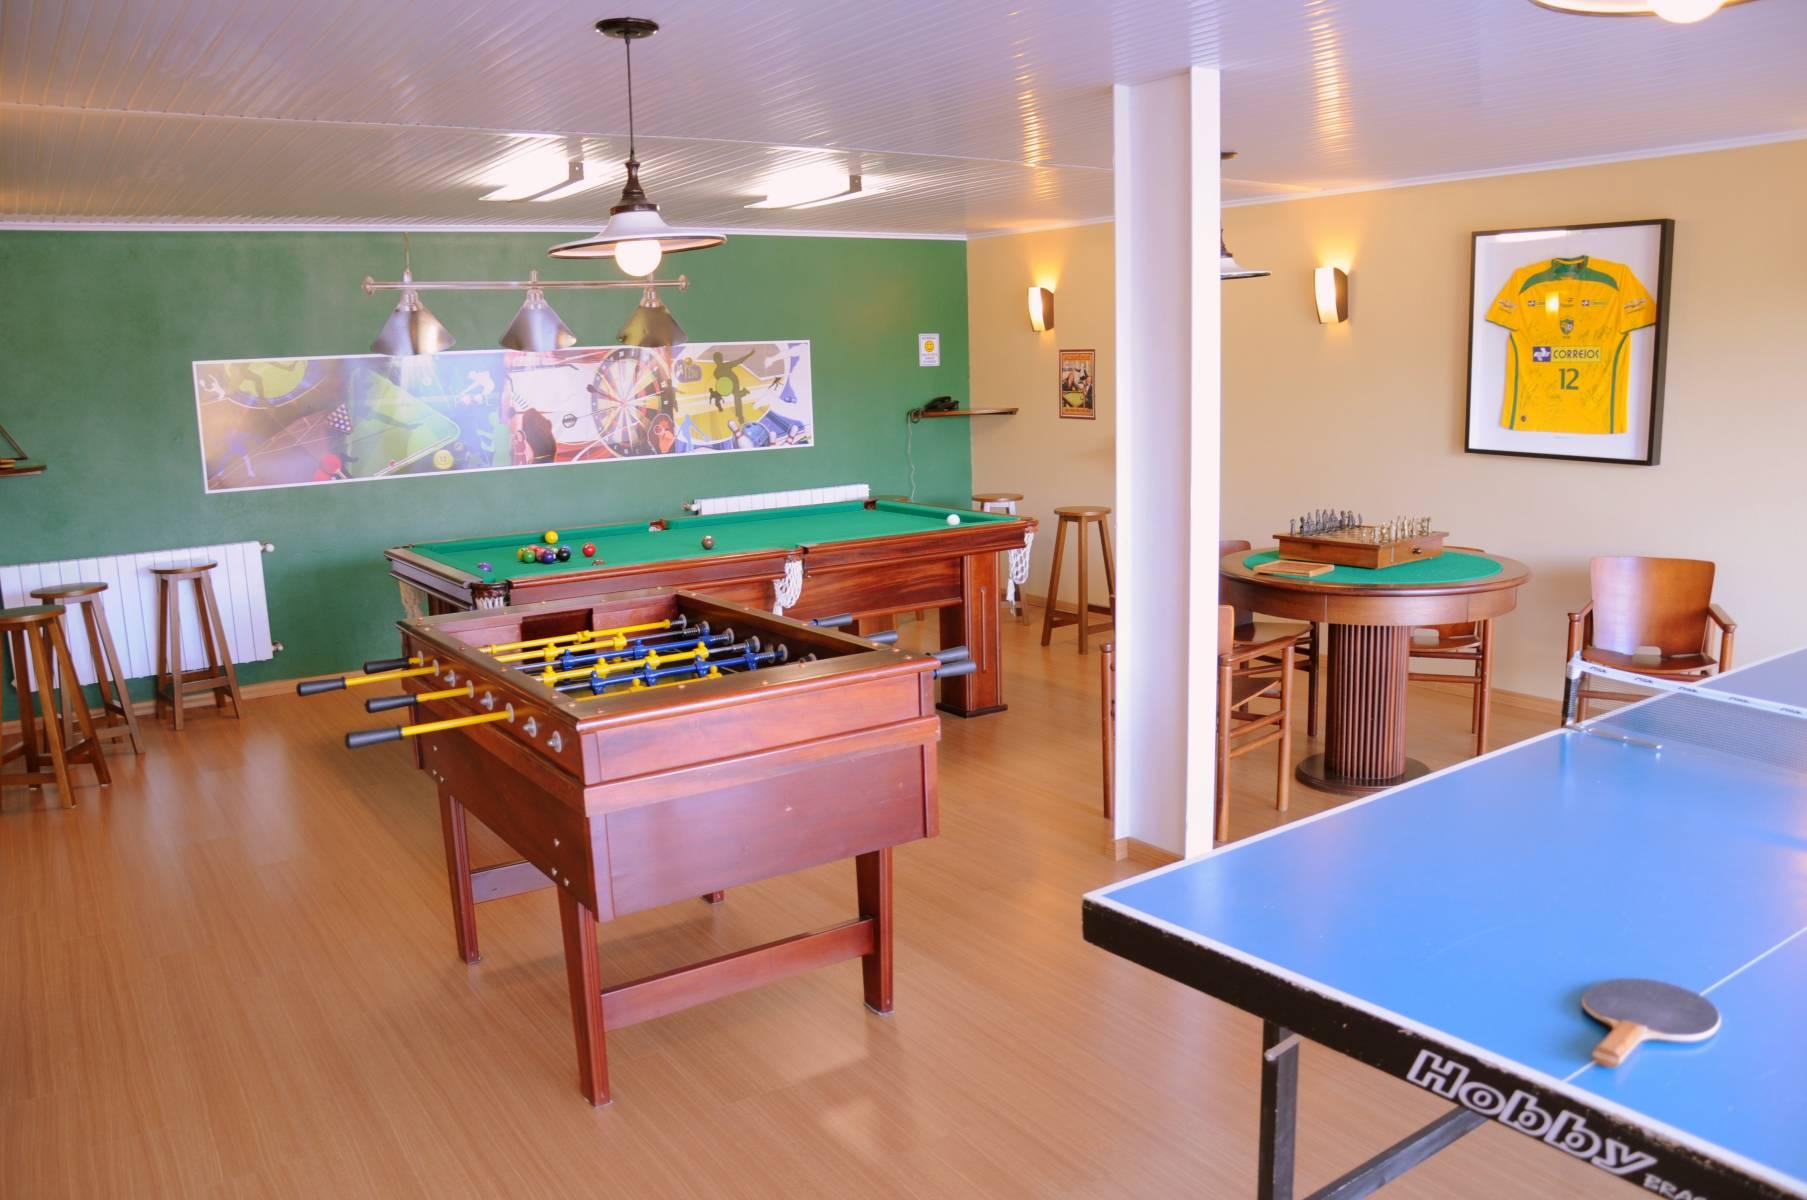 Sala de Jogos - Hotel Bangalôs da Serra #CurtaSuaFamilia #HotelSustentavel #TurismoVerde #TravelersChoice #EcoLider #Gramado